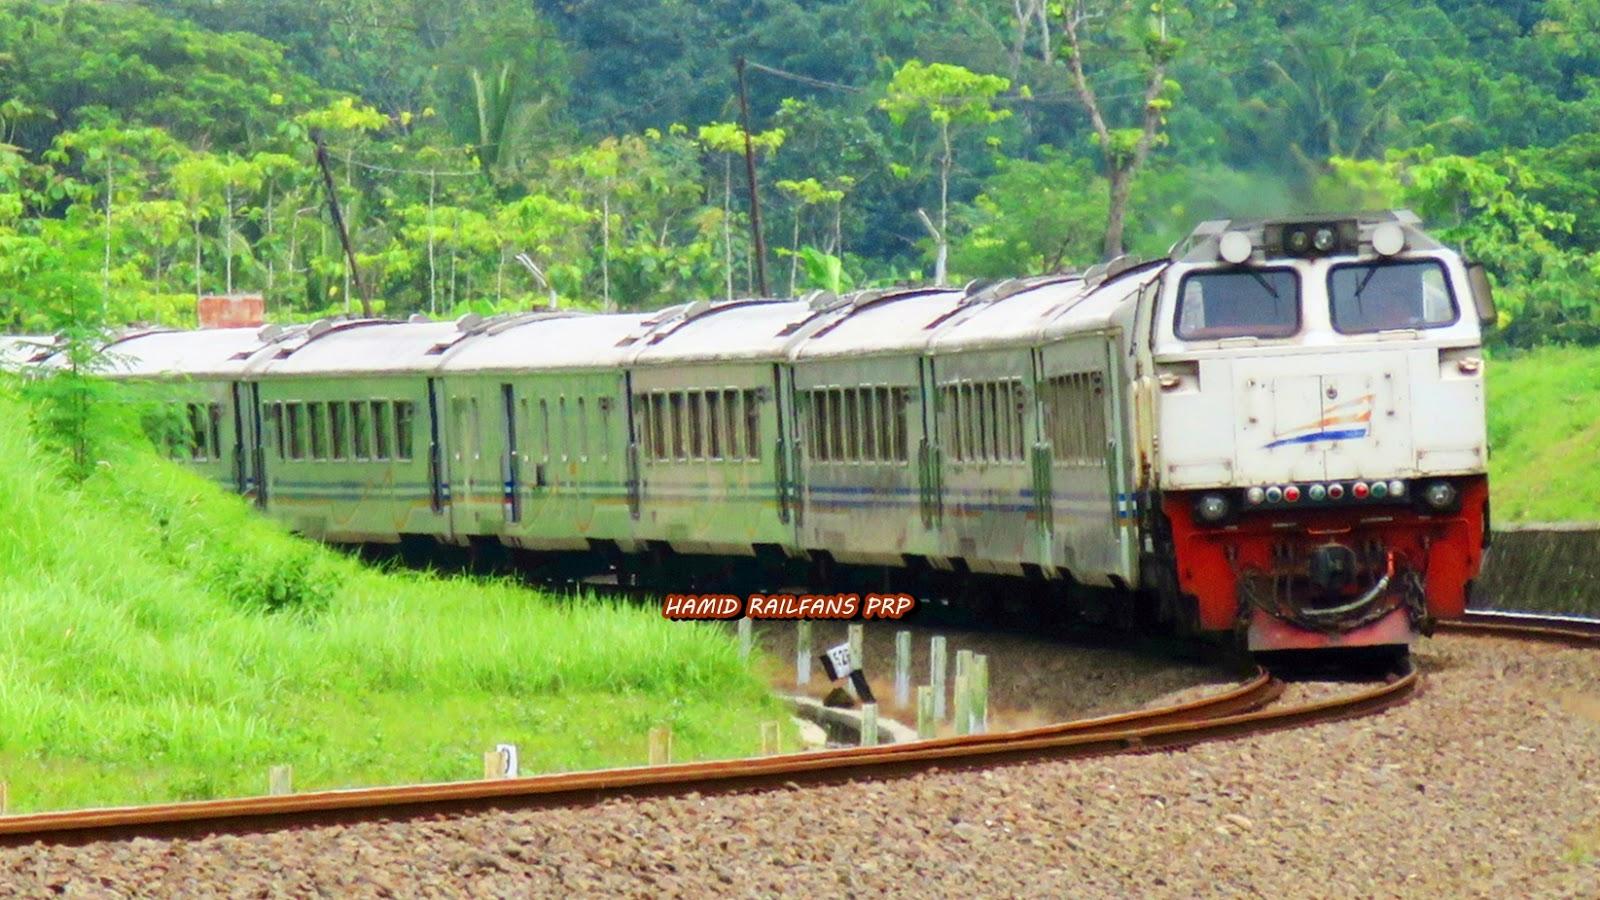 Jadwal Kereta Api Argo Wilis Terbaru 2019 Hamid Railfans Prp